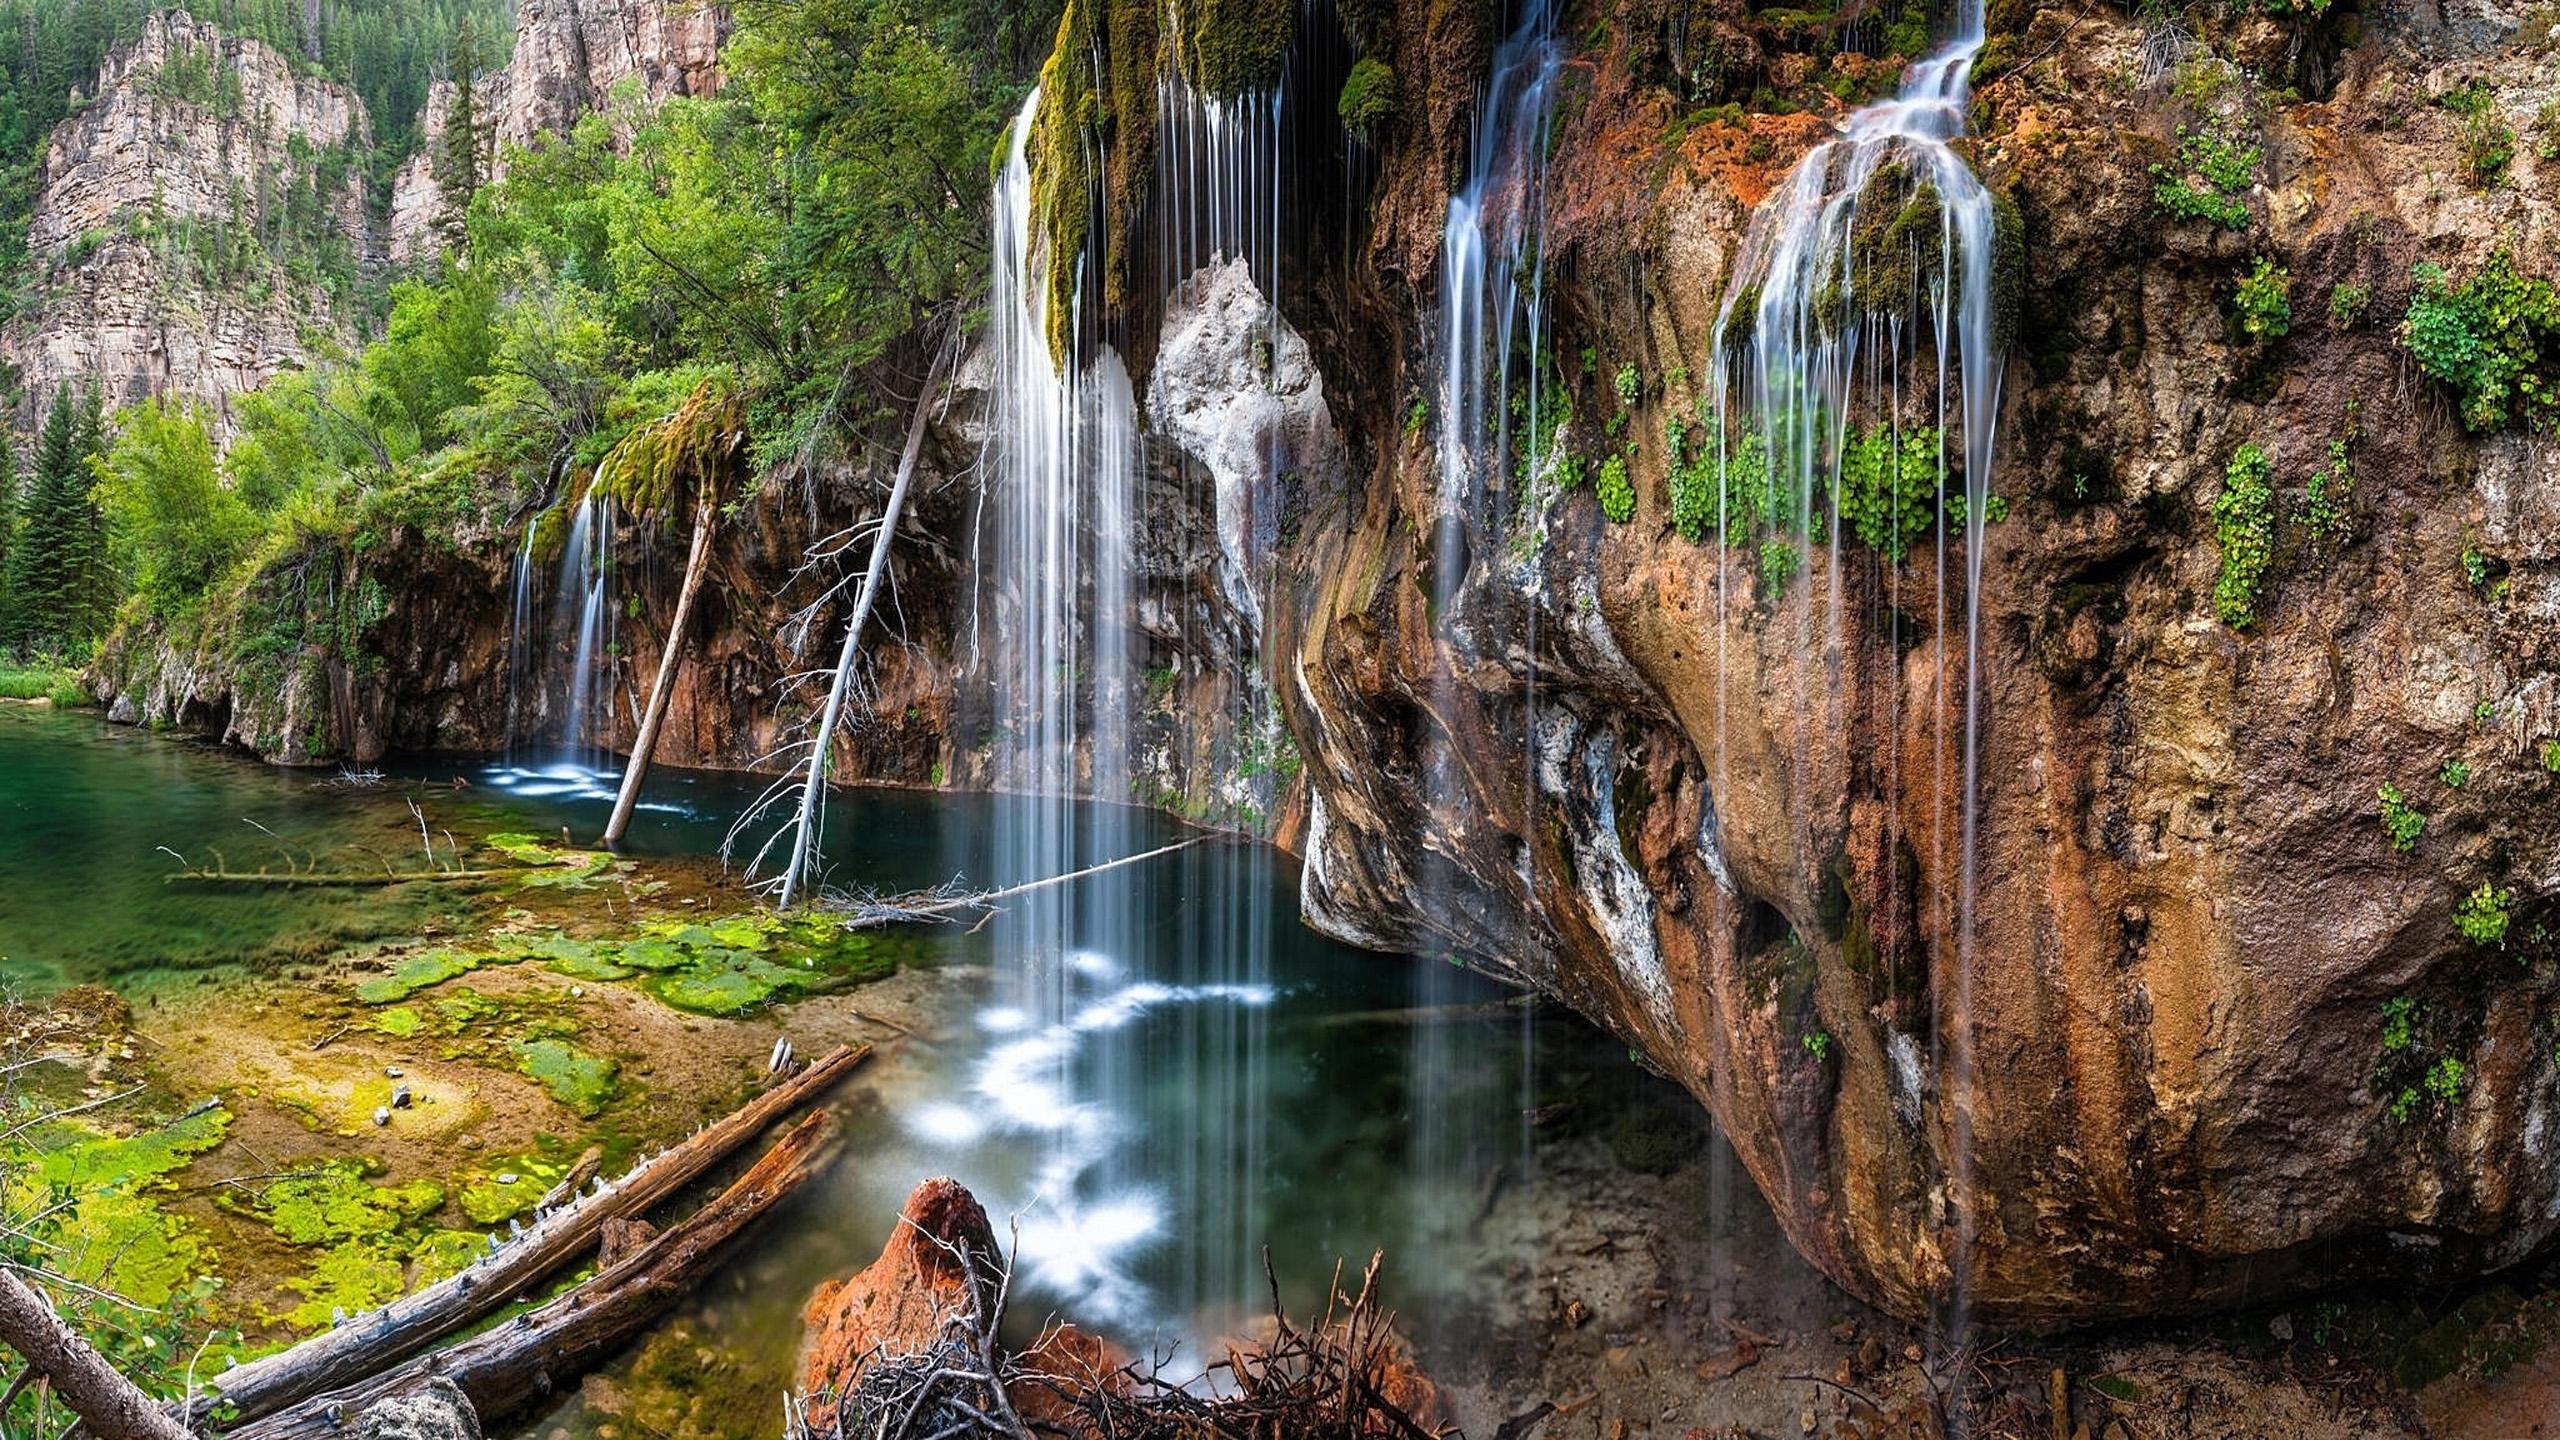 Fall Wallpaper 2017 Hanging Lake Glenwood Canyon 7 Miles East Of Glenwood